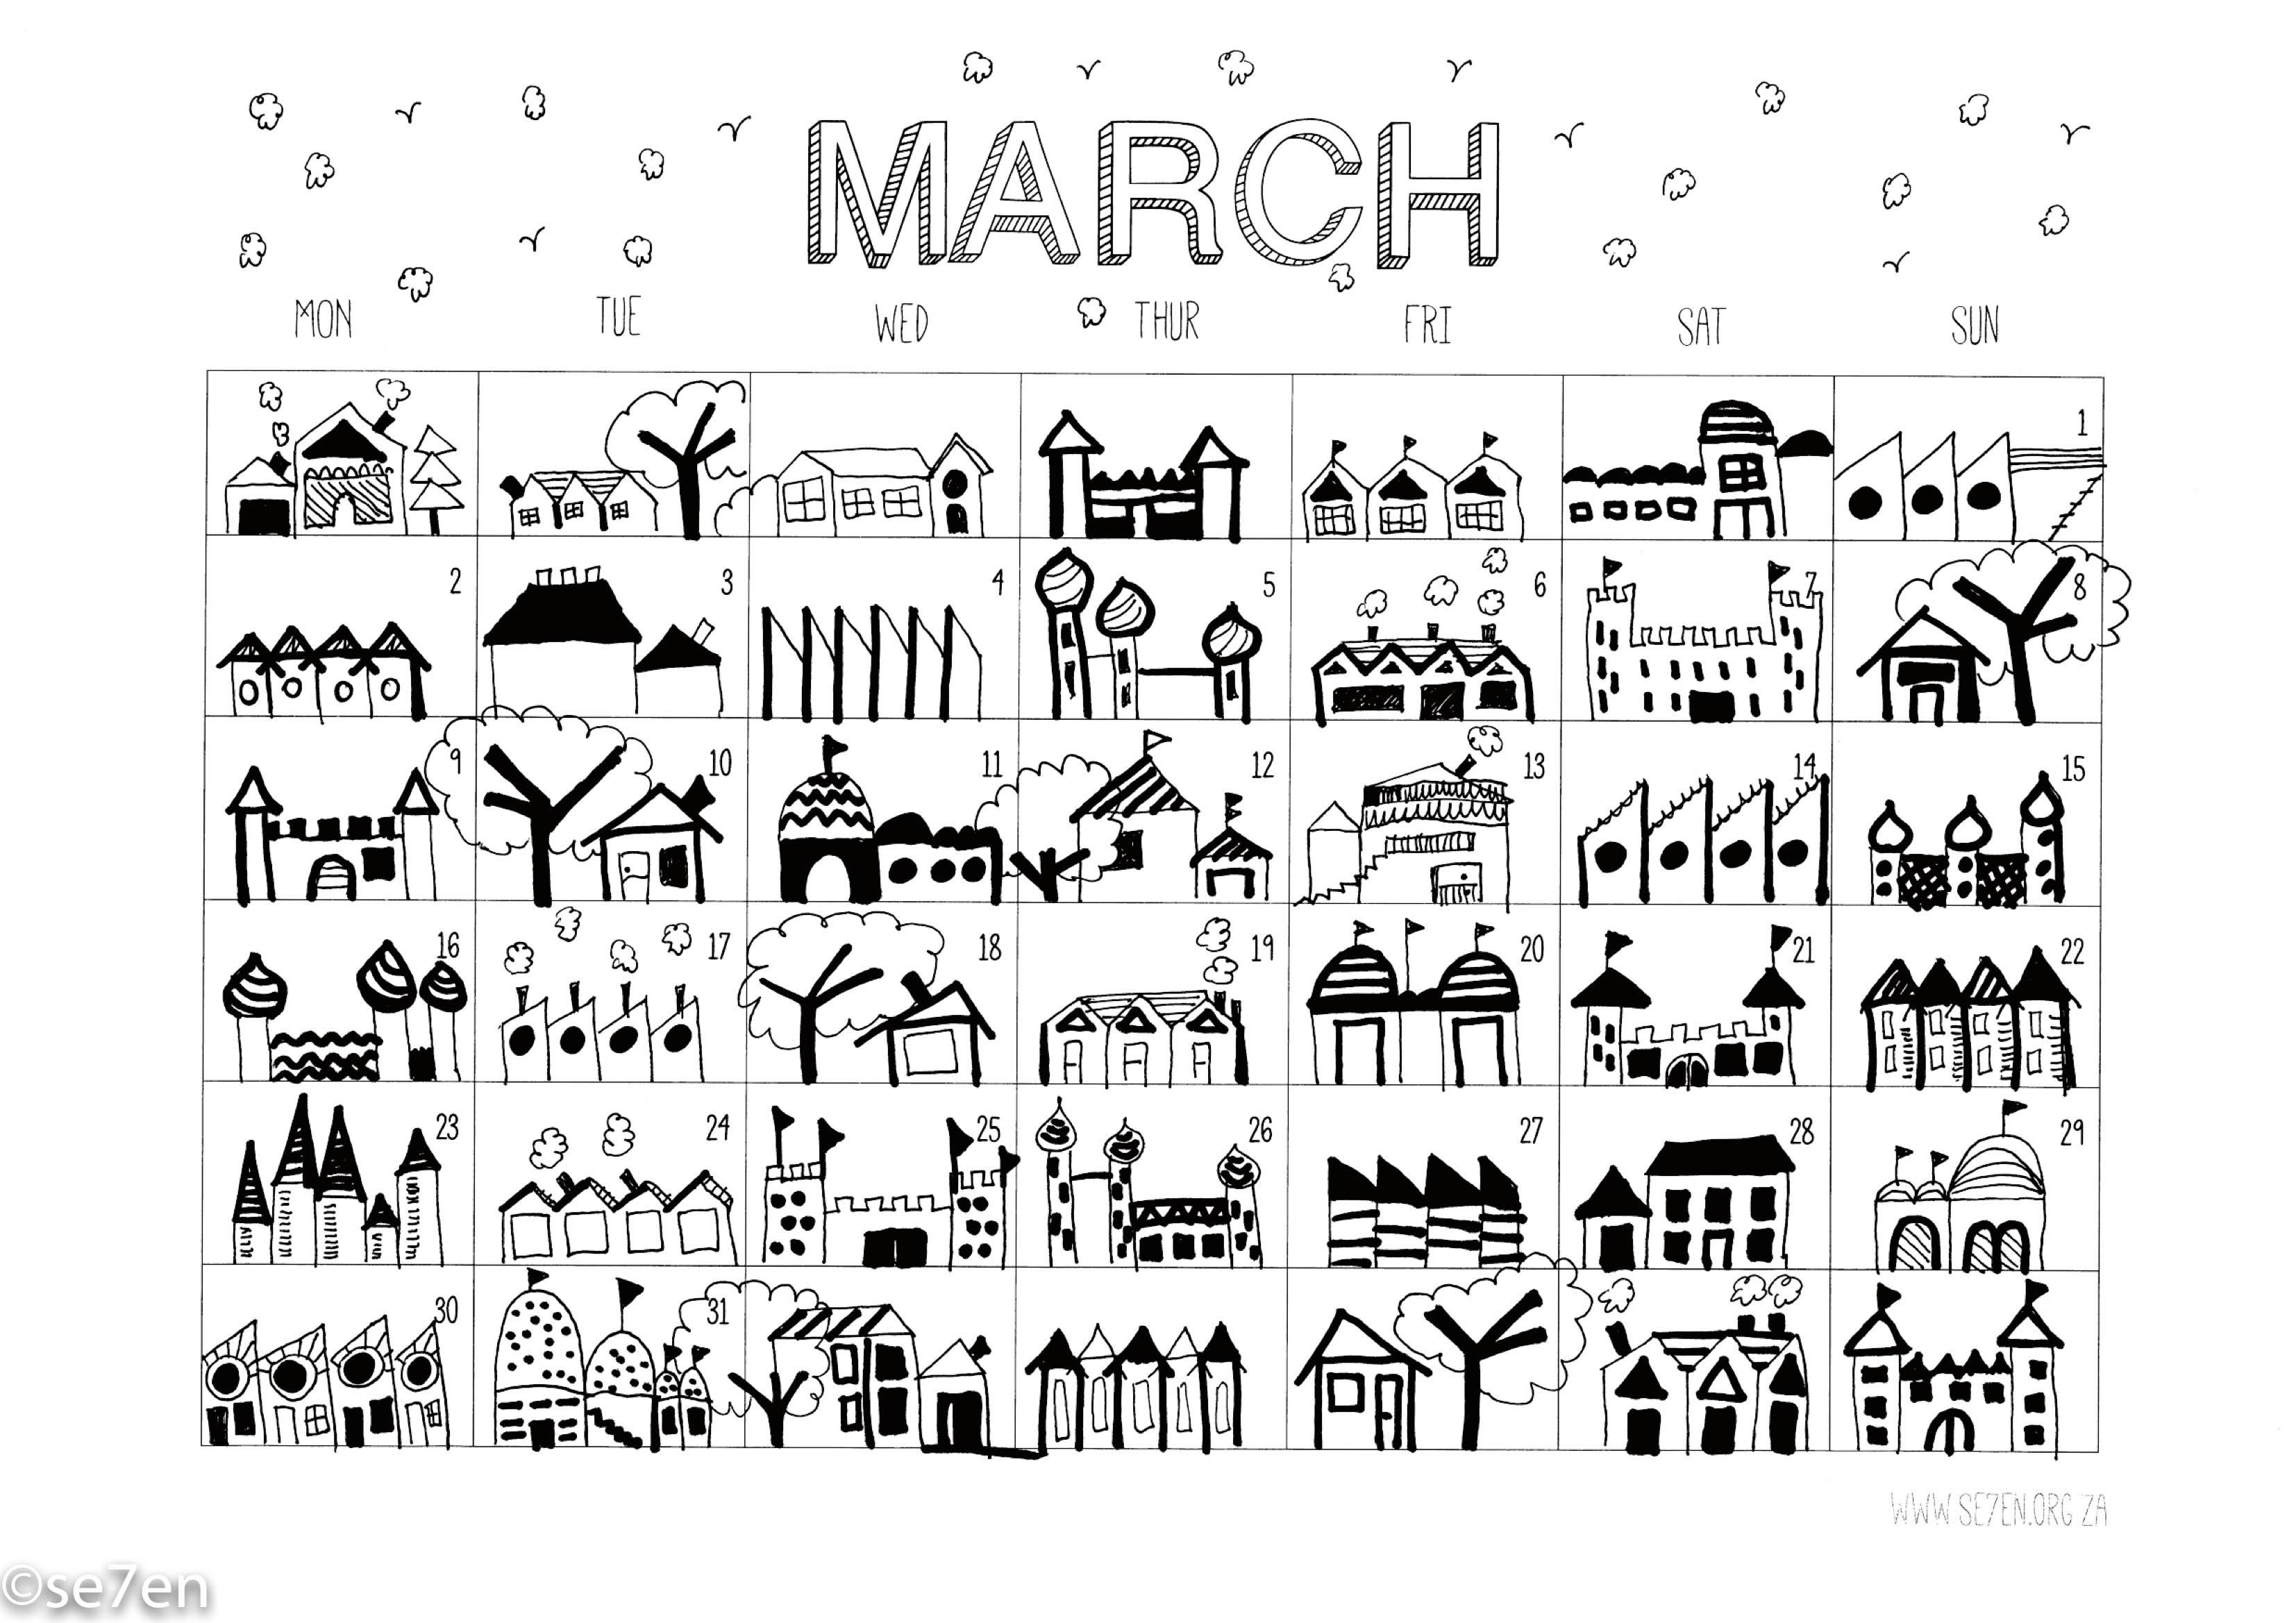 se7en-16-Feb-20-CalendarMonth-03